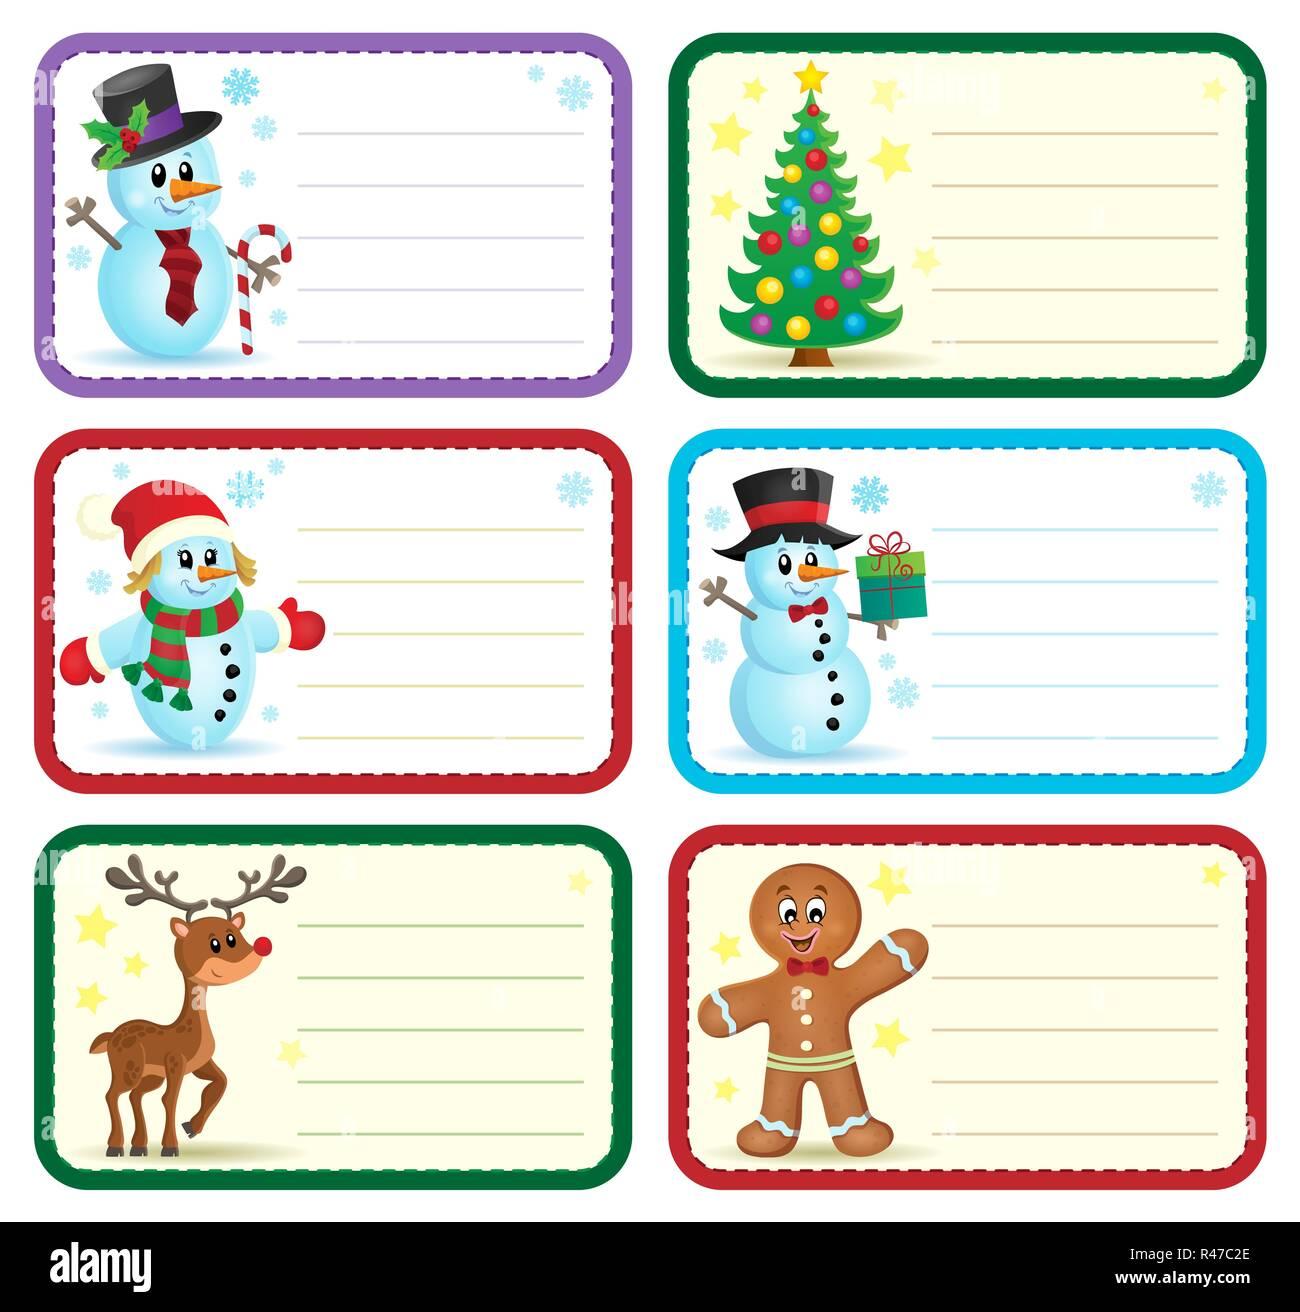 Christmas Name Tags.Christmas Name Tags Collection 1 Stock Photo 226356550 Alamy